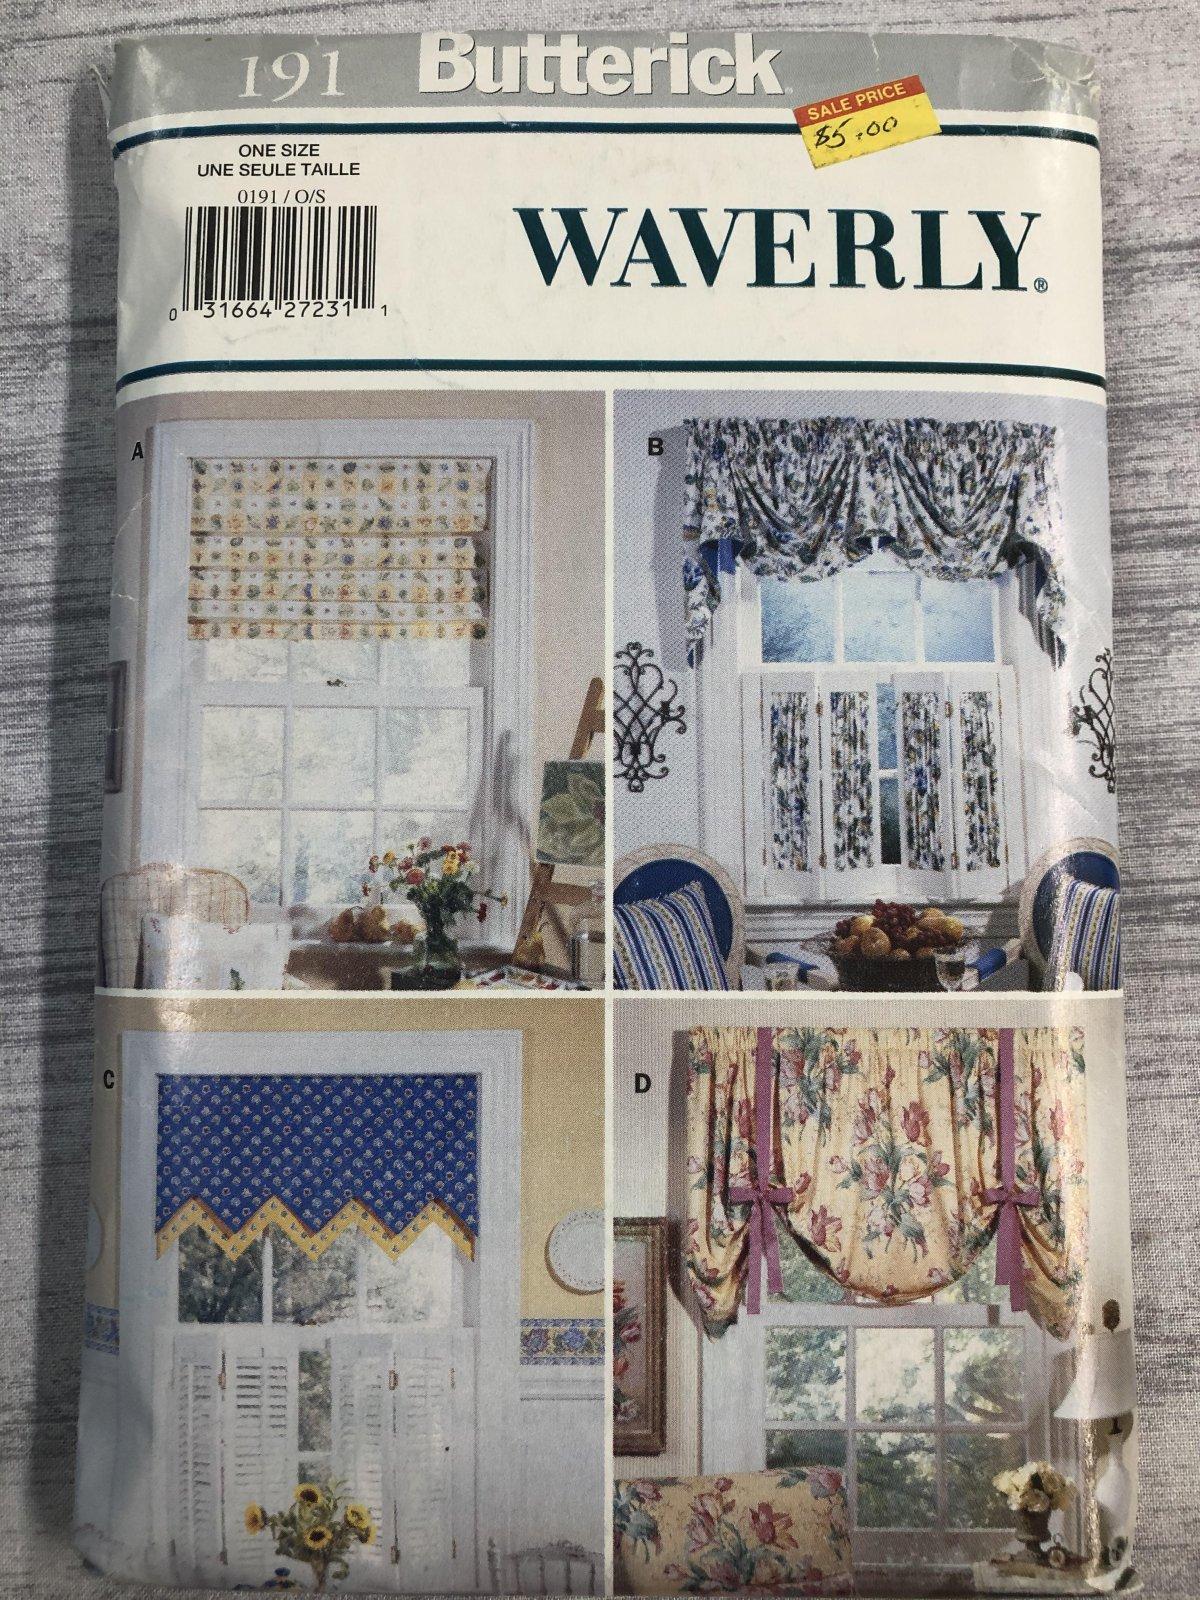 Butterick Waverly 0191